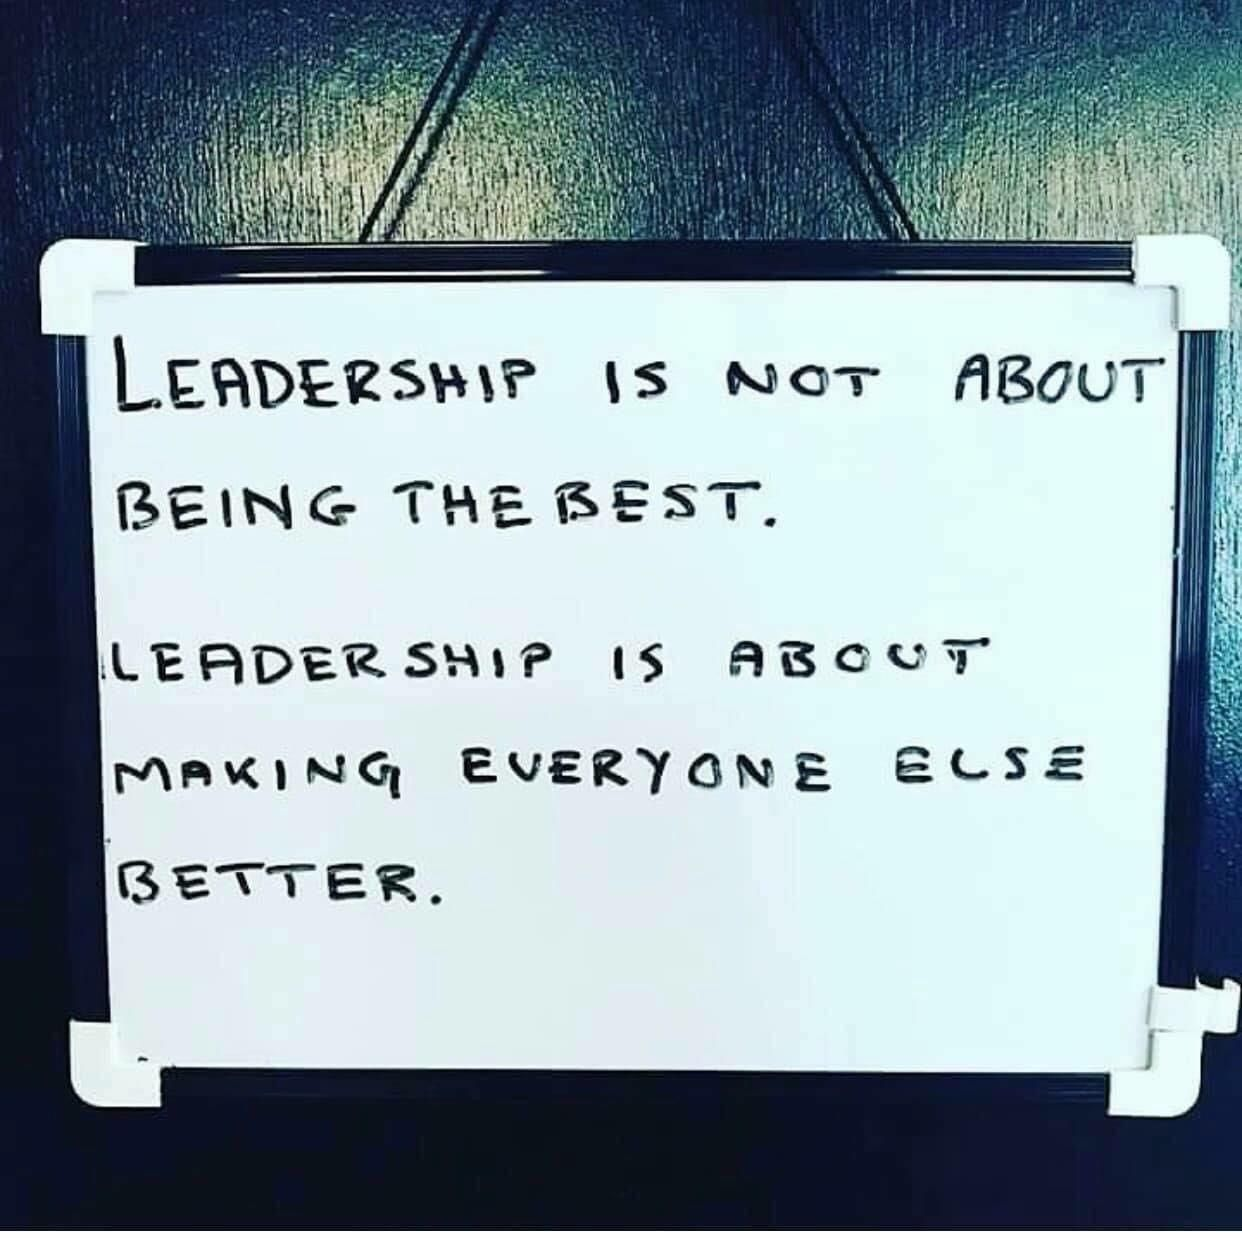 Pin By Nikala O Johnson On Quiet Leadership Leadership Quotes Leadership Lessons Learned In Life